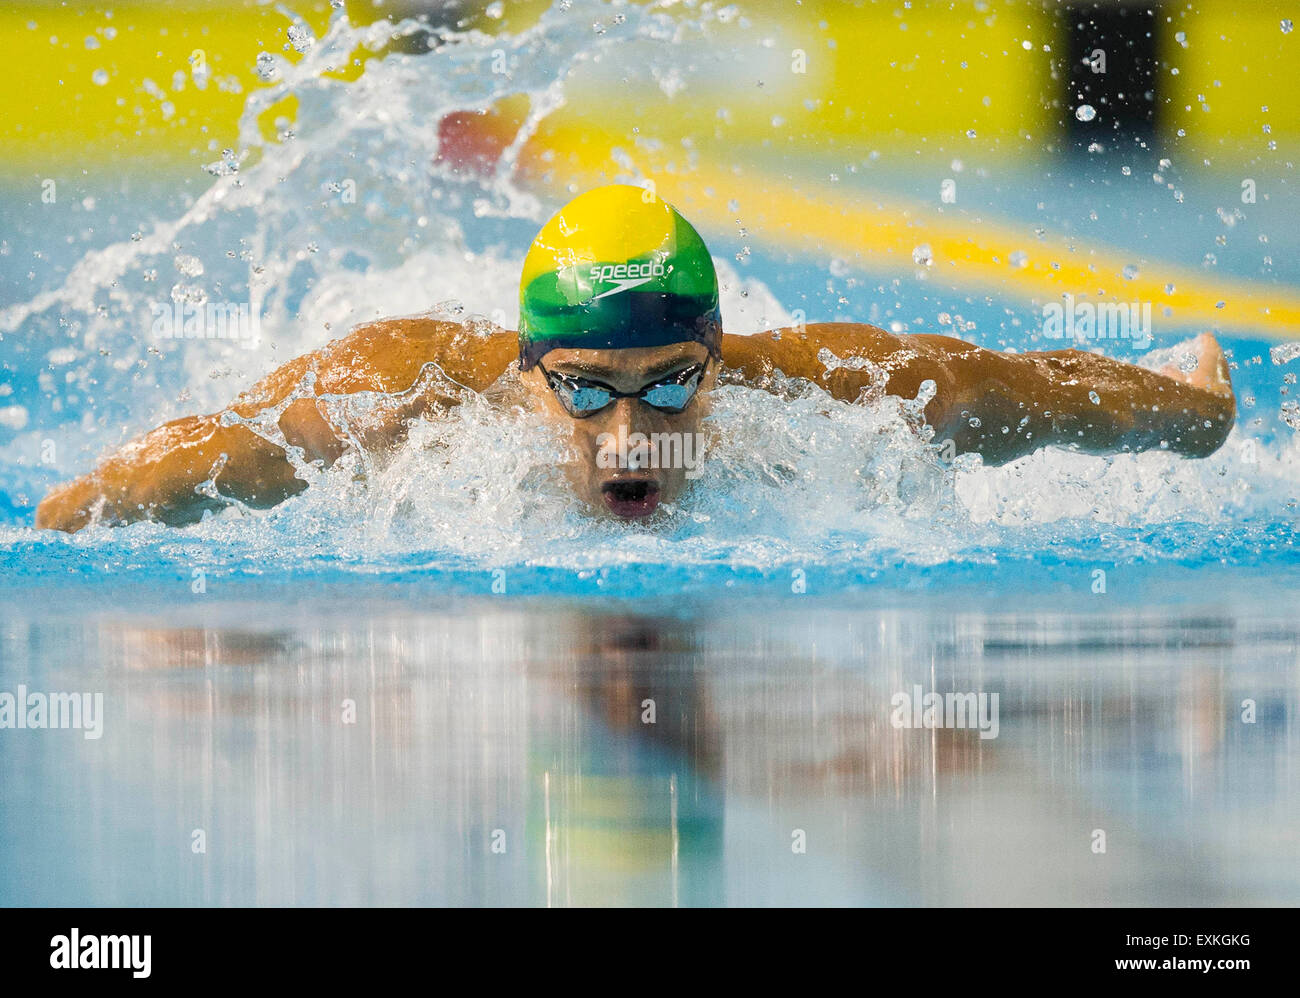 Toronto, Kanada. 14. Juli 2015. Leonardo De Deus Brasilien konkurriert die Männer 200m Schmetterling Finale Stockbild